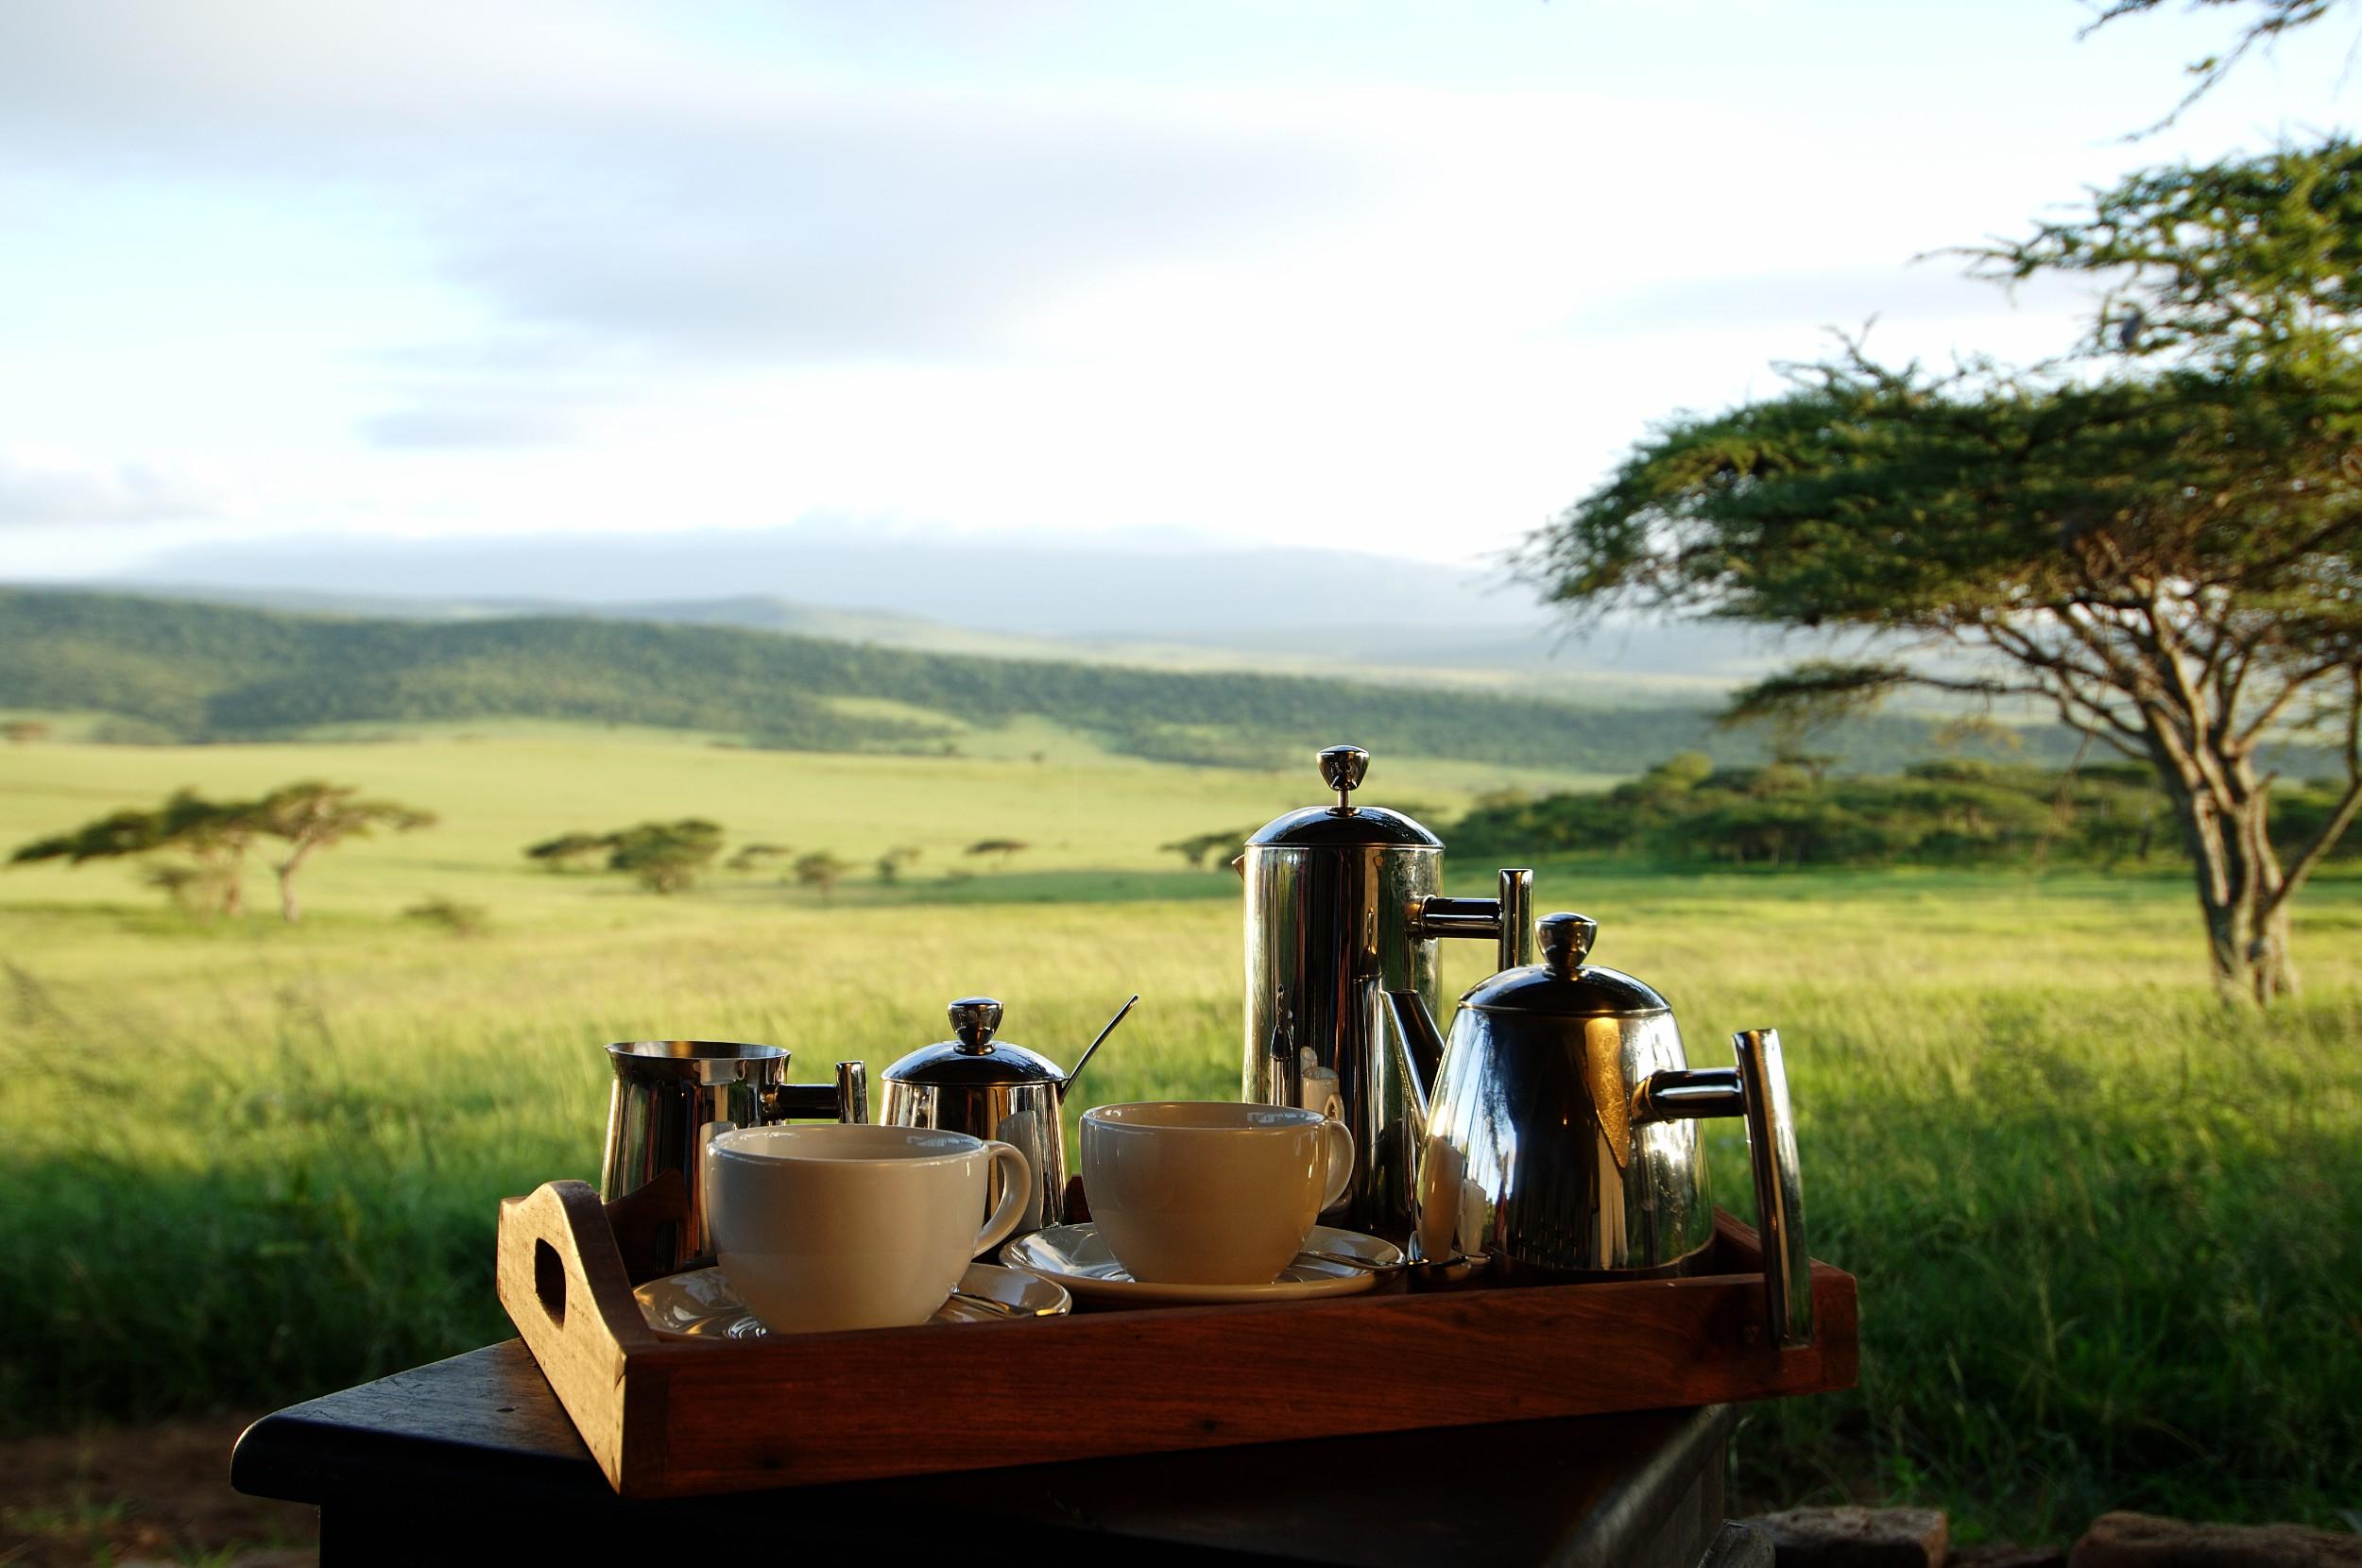 Dunia-Camp-morning-coffee.jpg